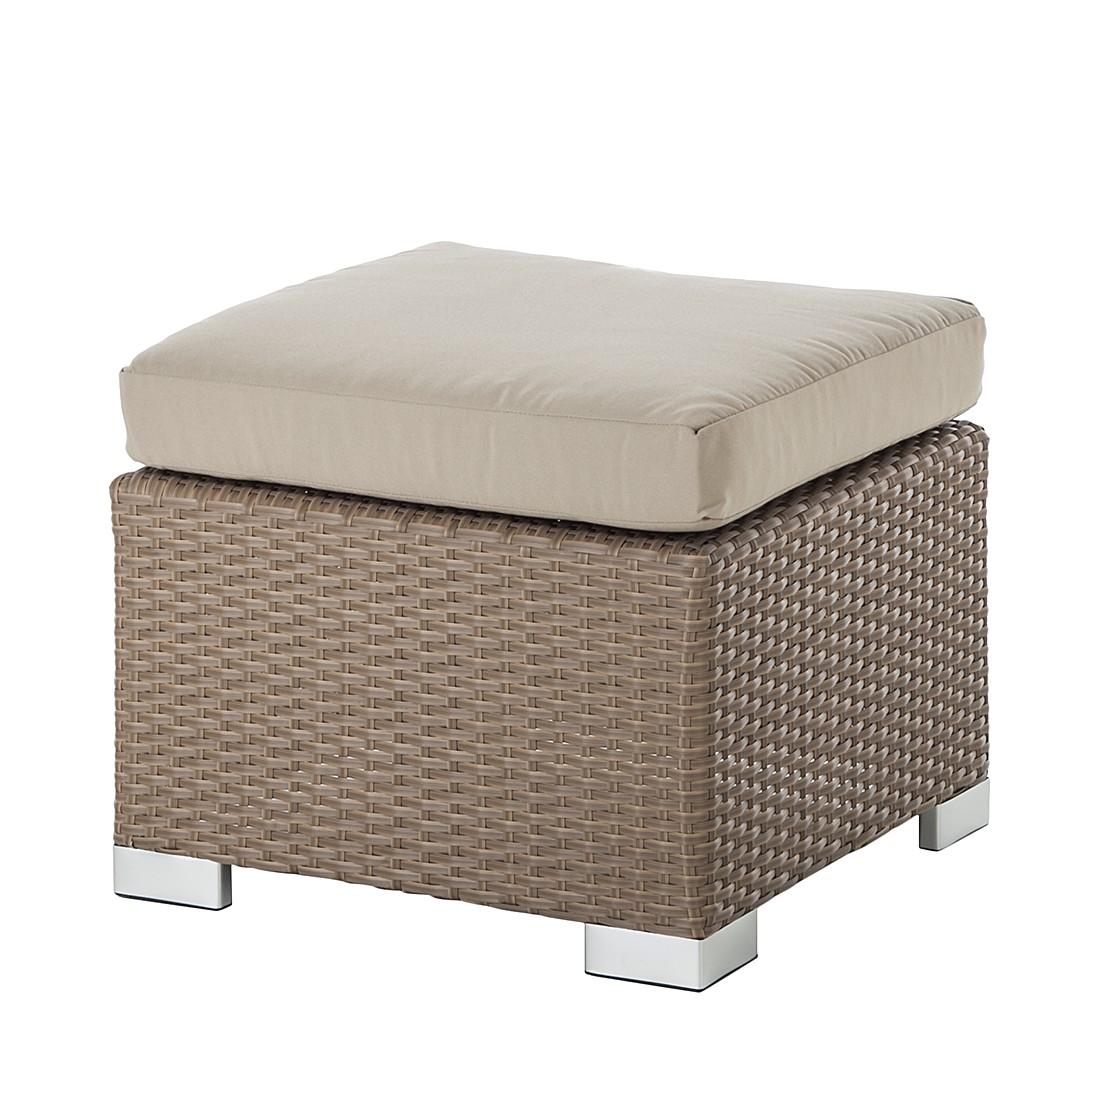 hocker rattanesco puca polyrattan textil braun beige. Black Bedroom Furniture Sets. Home Design Ideas